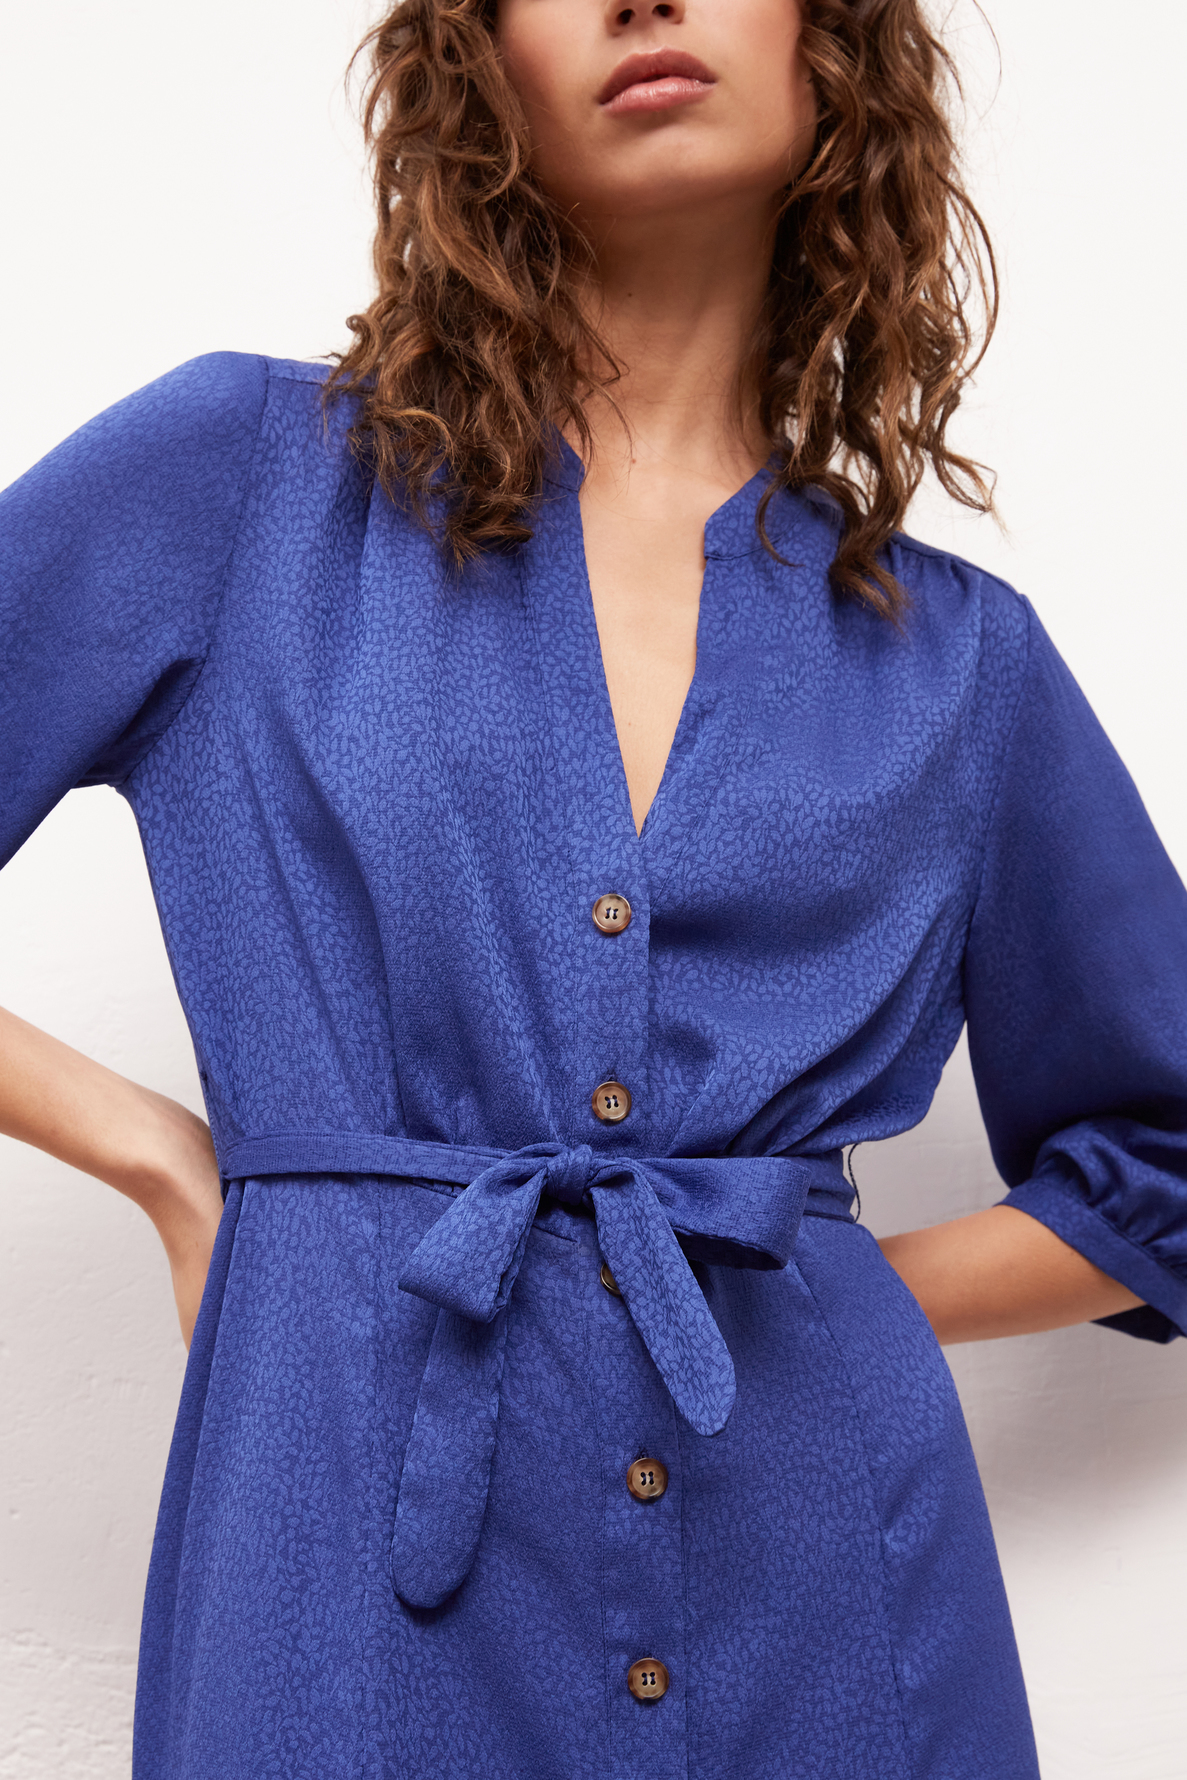 SETTIMA - платье-рубашка средней длины из жаккарда